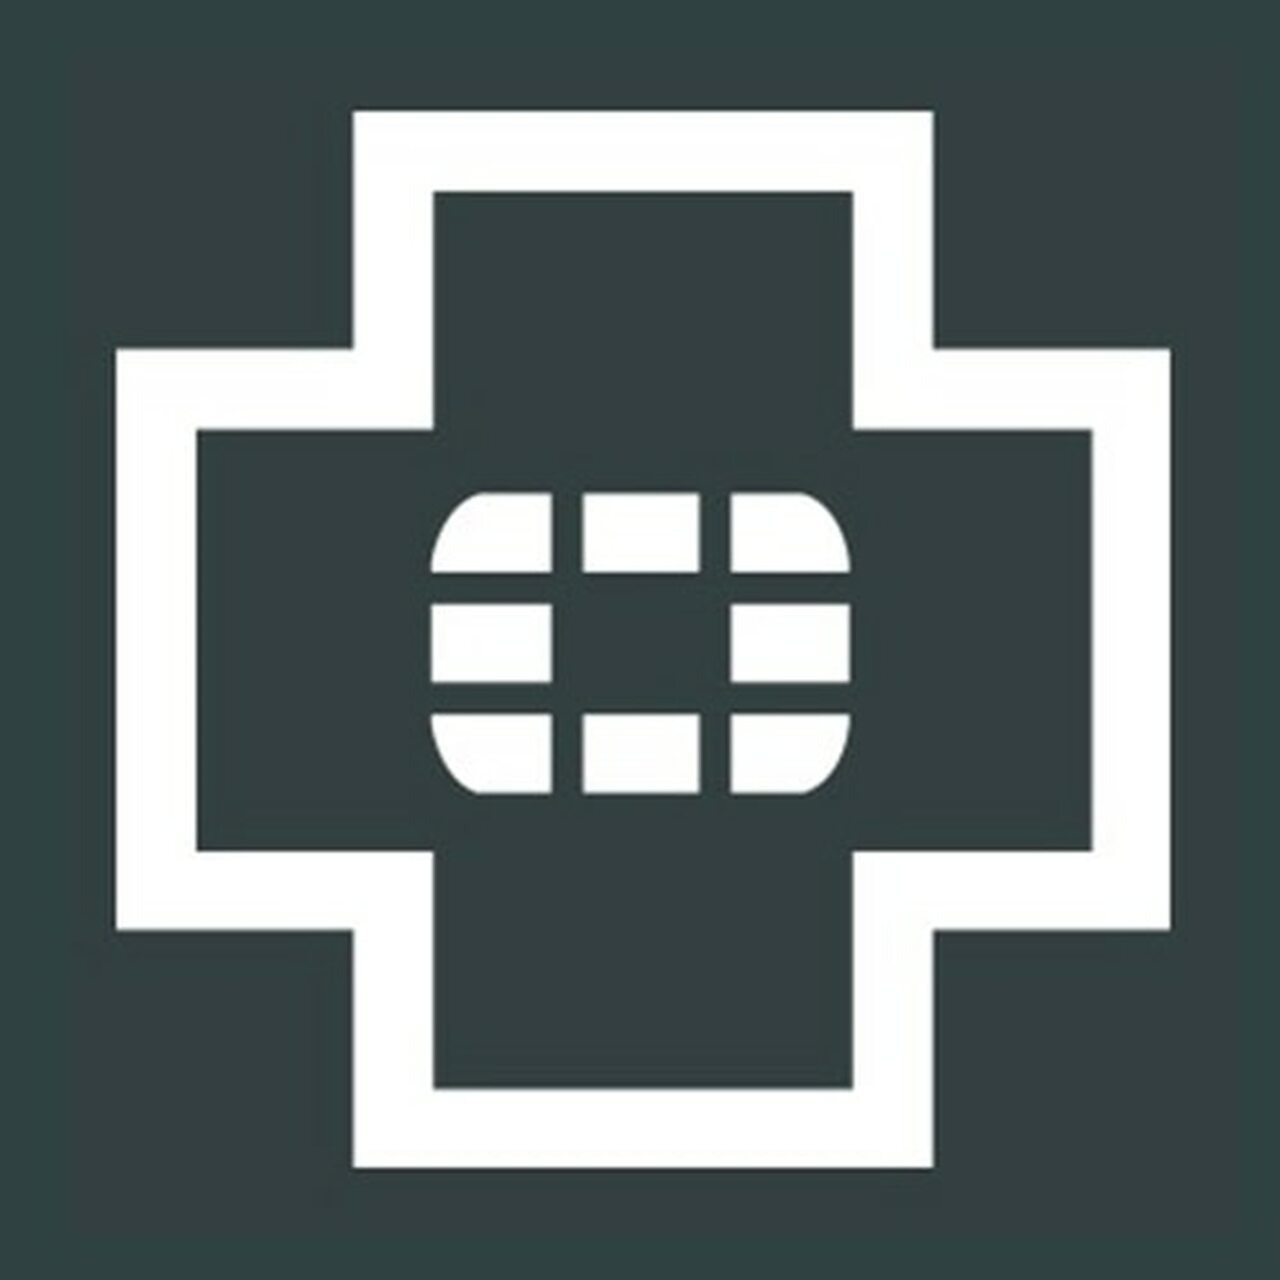 FortiGate-140E - 8x5 FortiCare Contract - 12 months